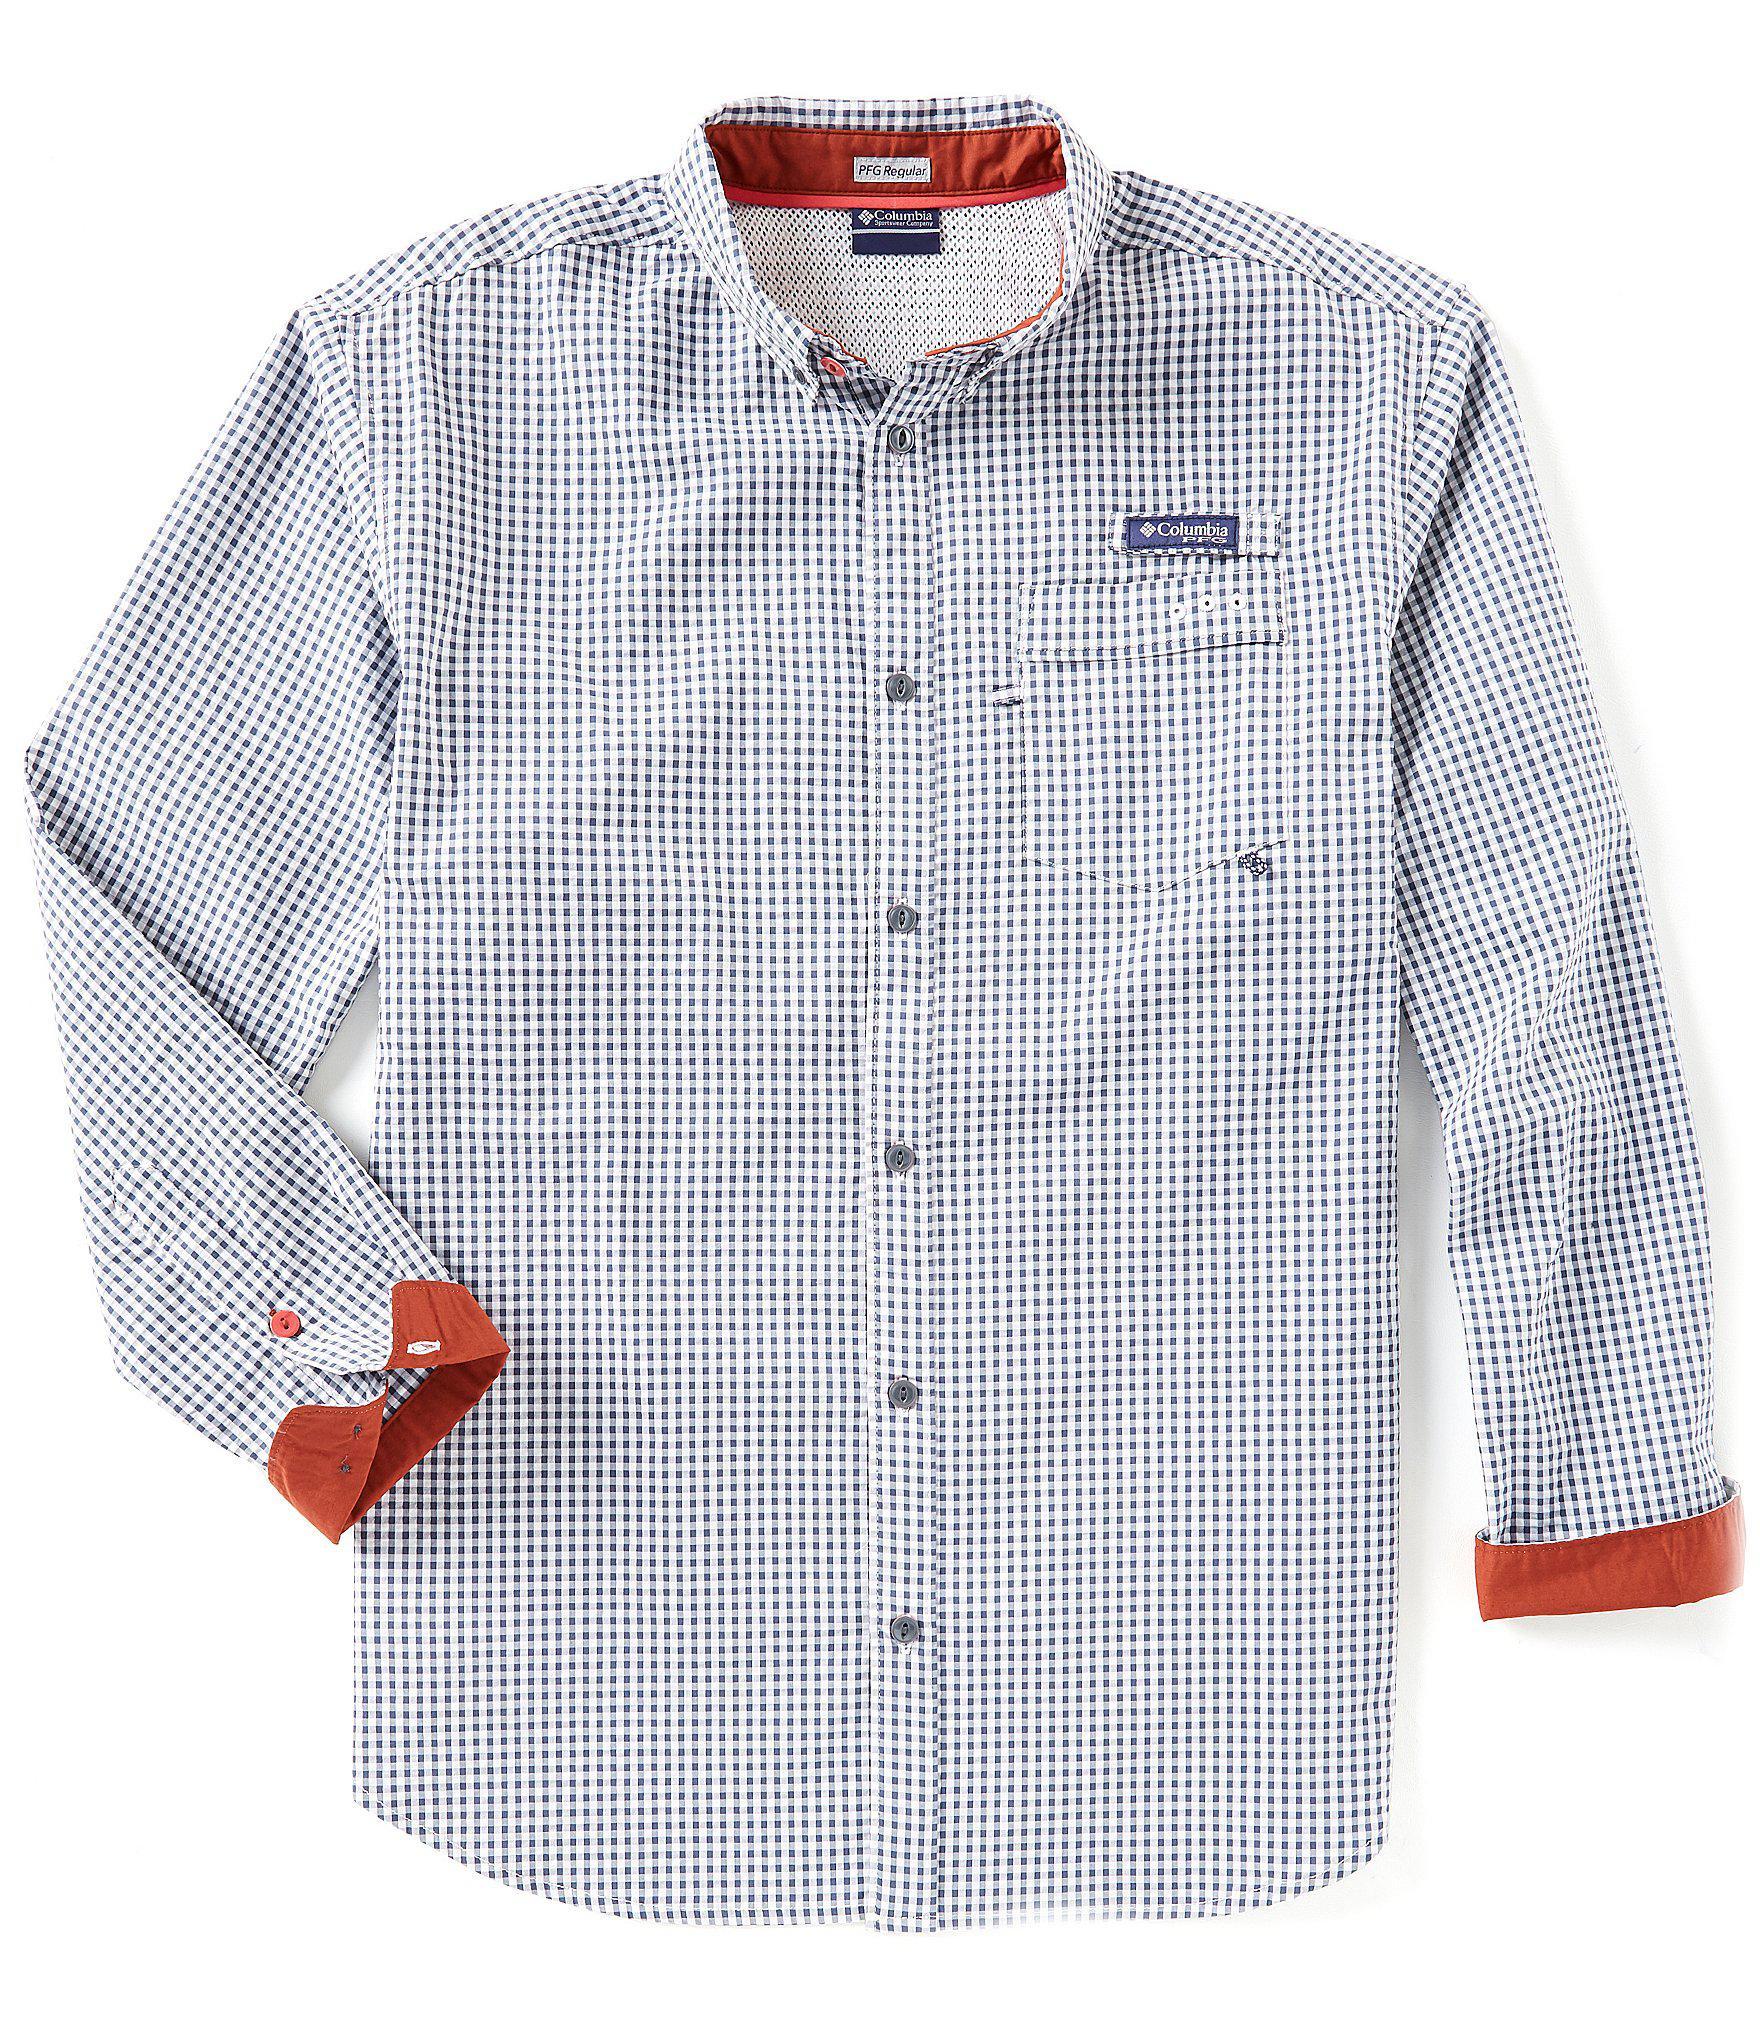 78aa86a2b1b Lyst - Columbia Pfg Super Harborside Gingham Long-sleeve Woven Shirt ...